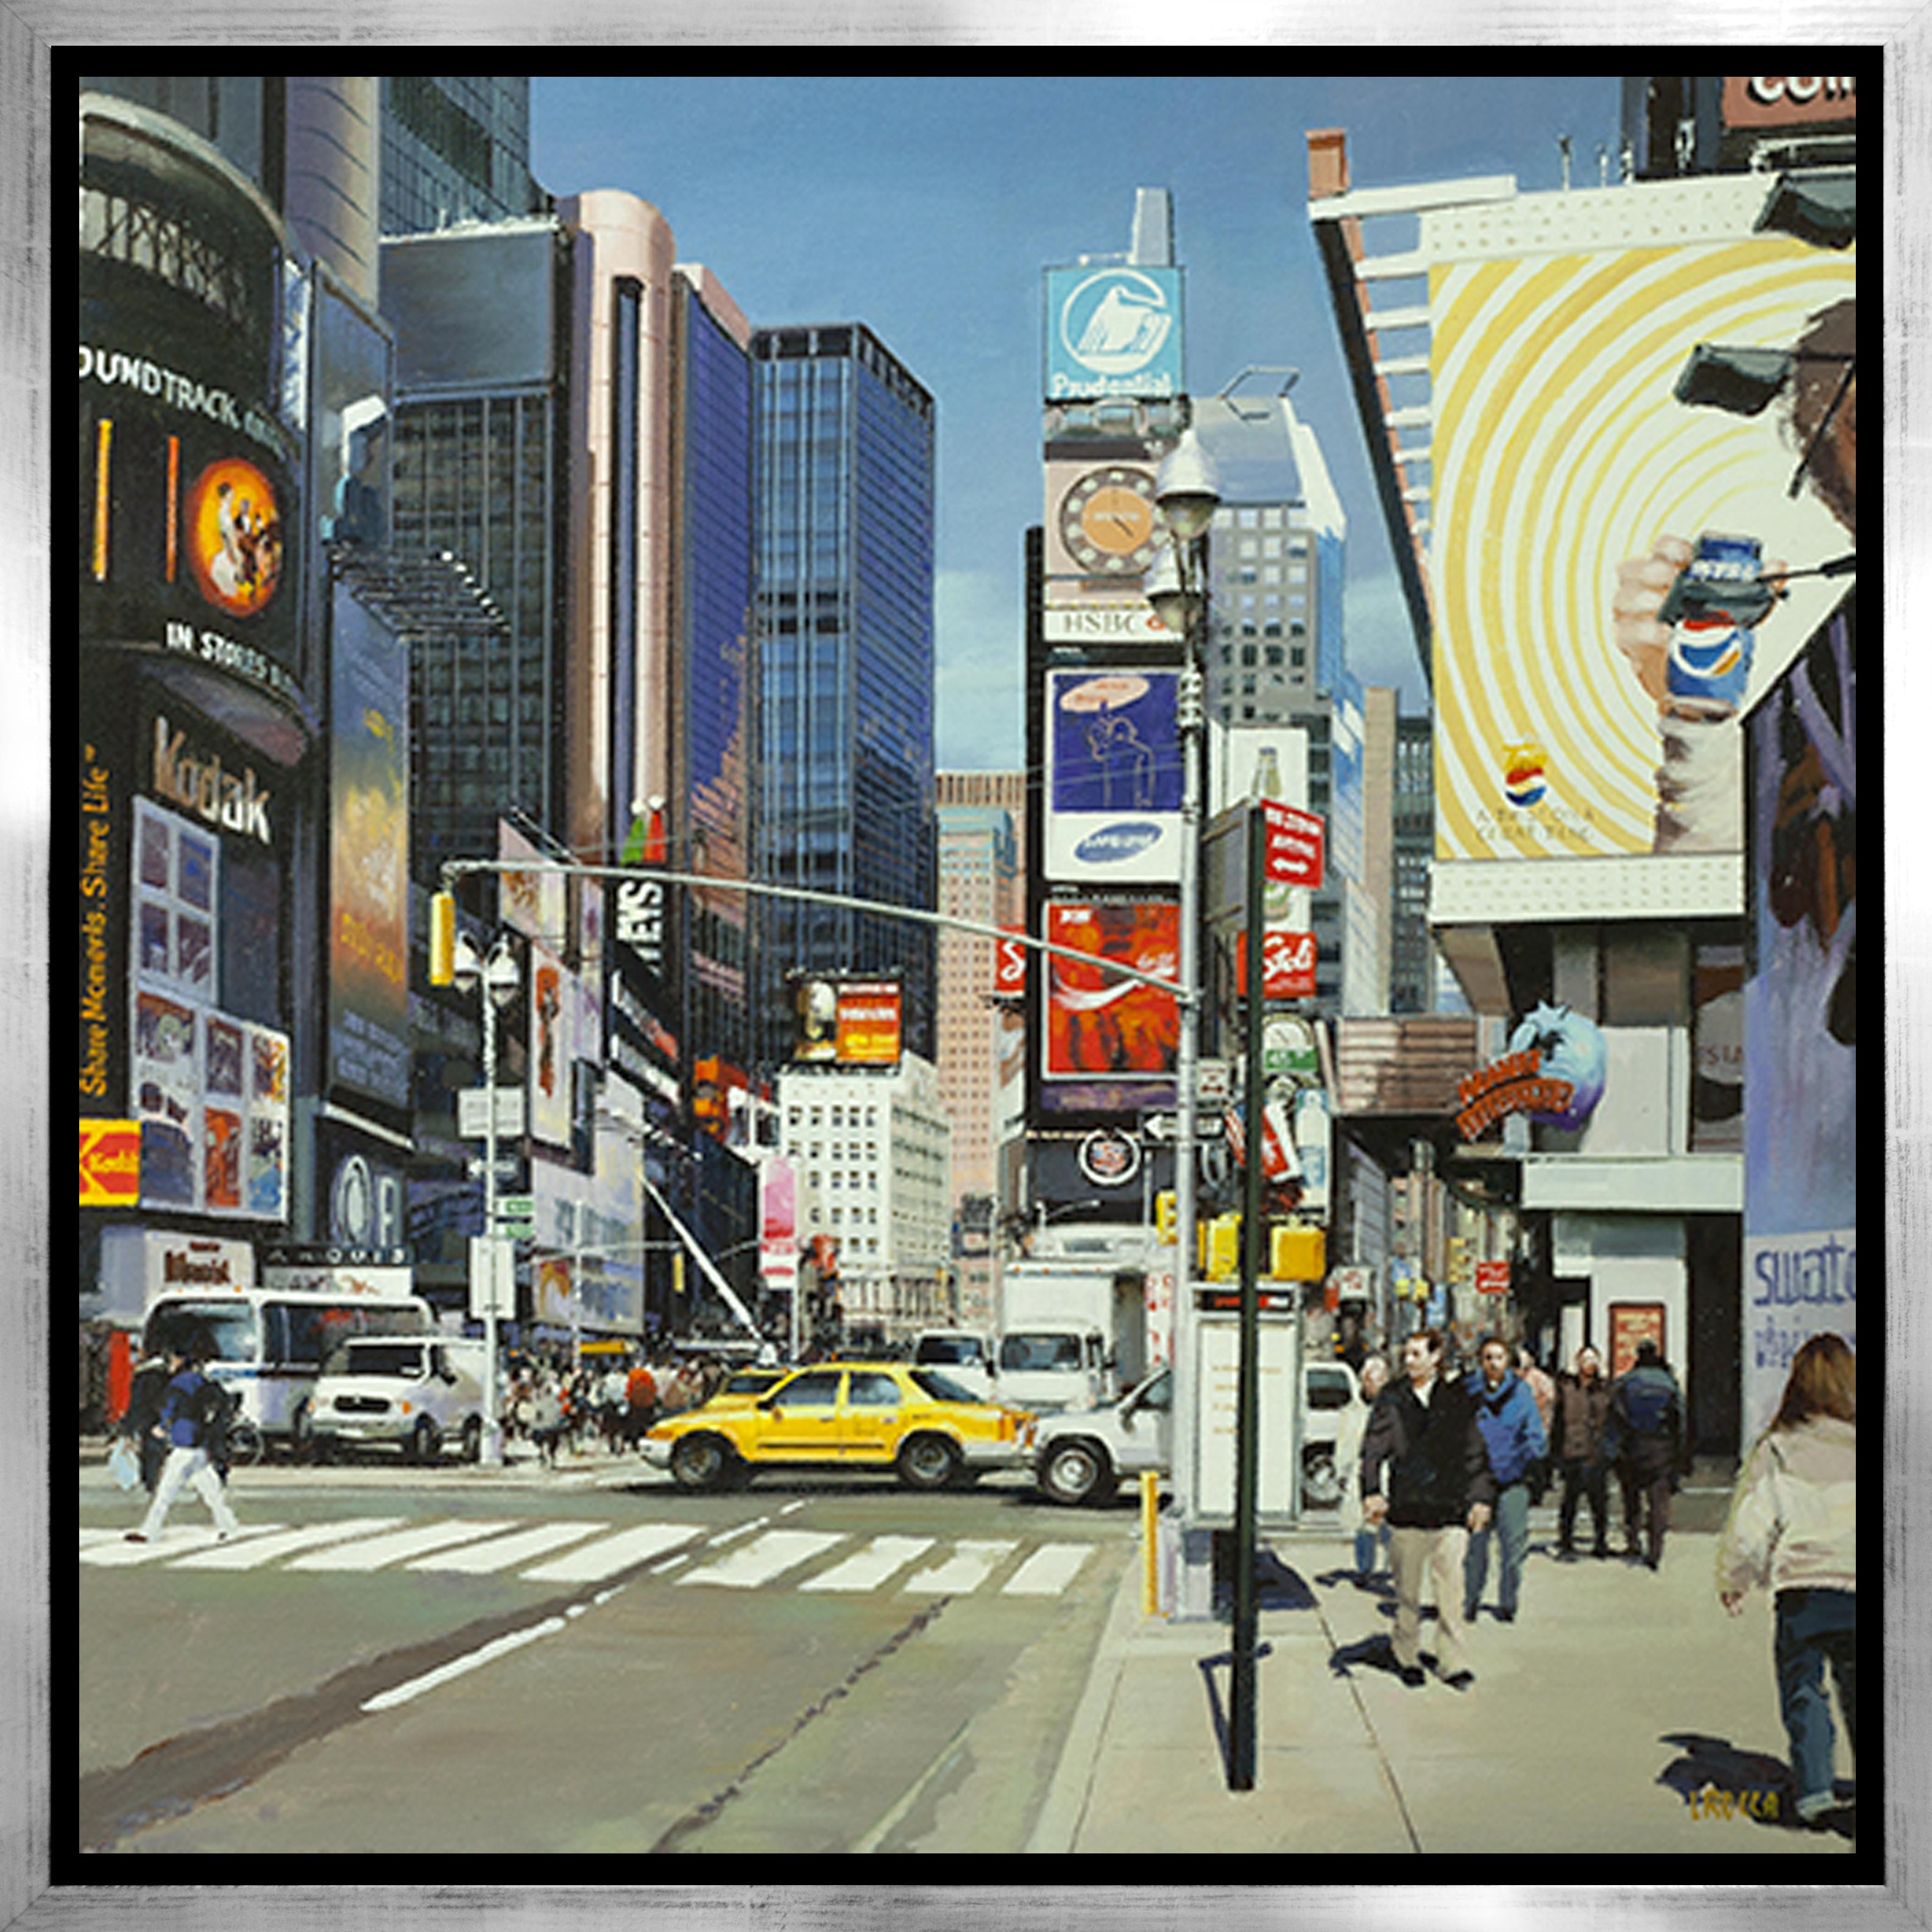 Luigi Rocca - EYS, Times Square , 6855-006-083